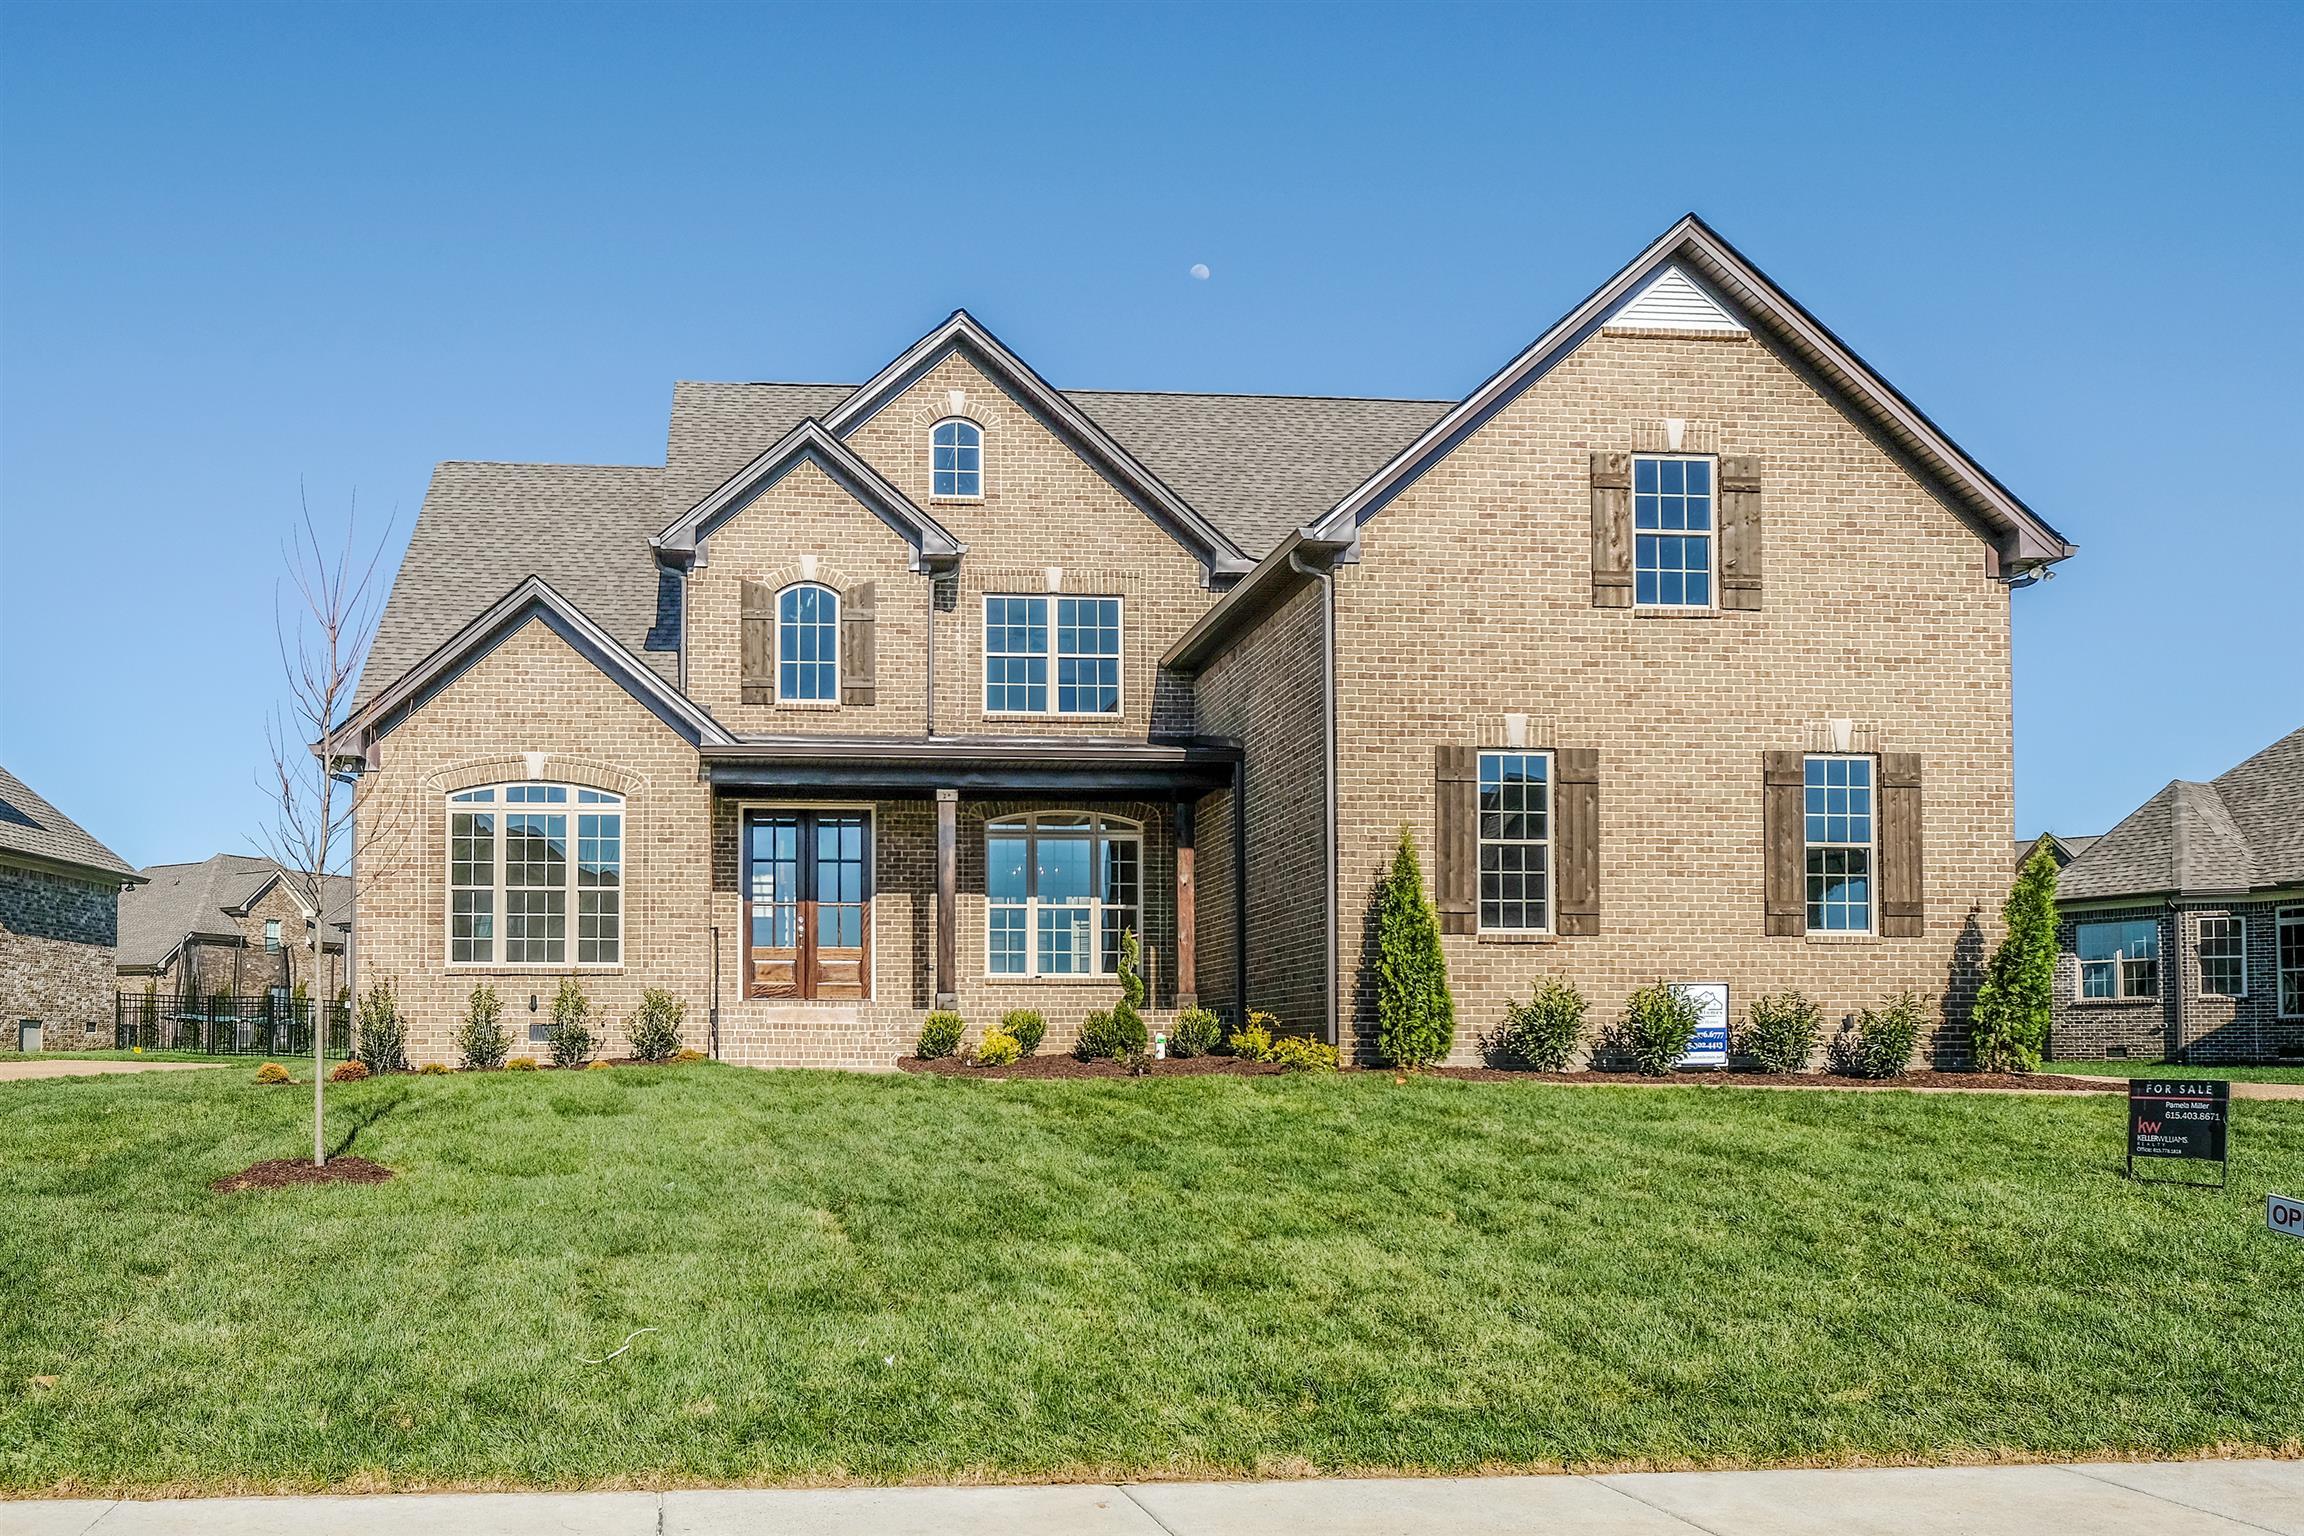 4013 Cardigan Ln (Lot 273), Spring Hill, TN 37174 - Spring Hill, TN real estate listing